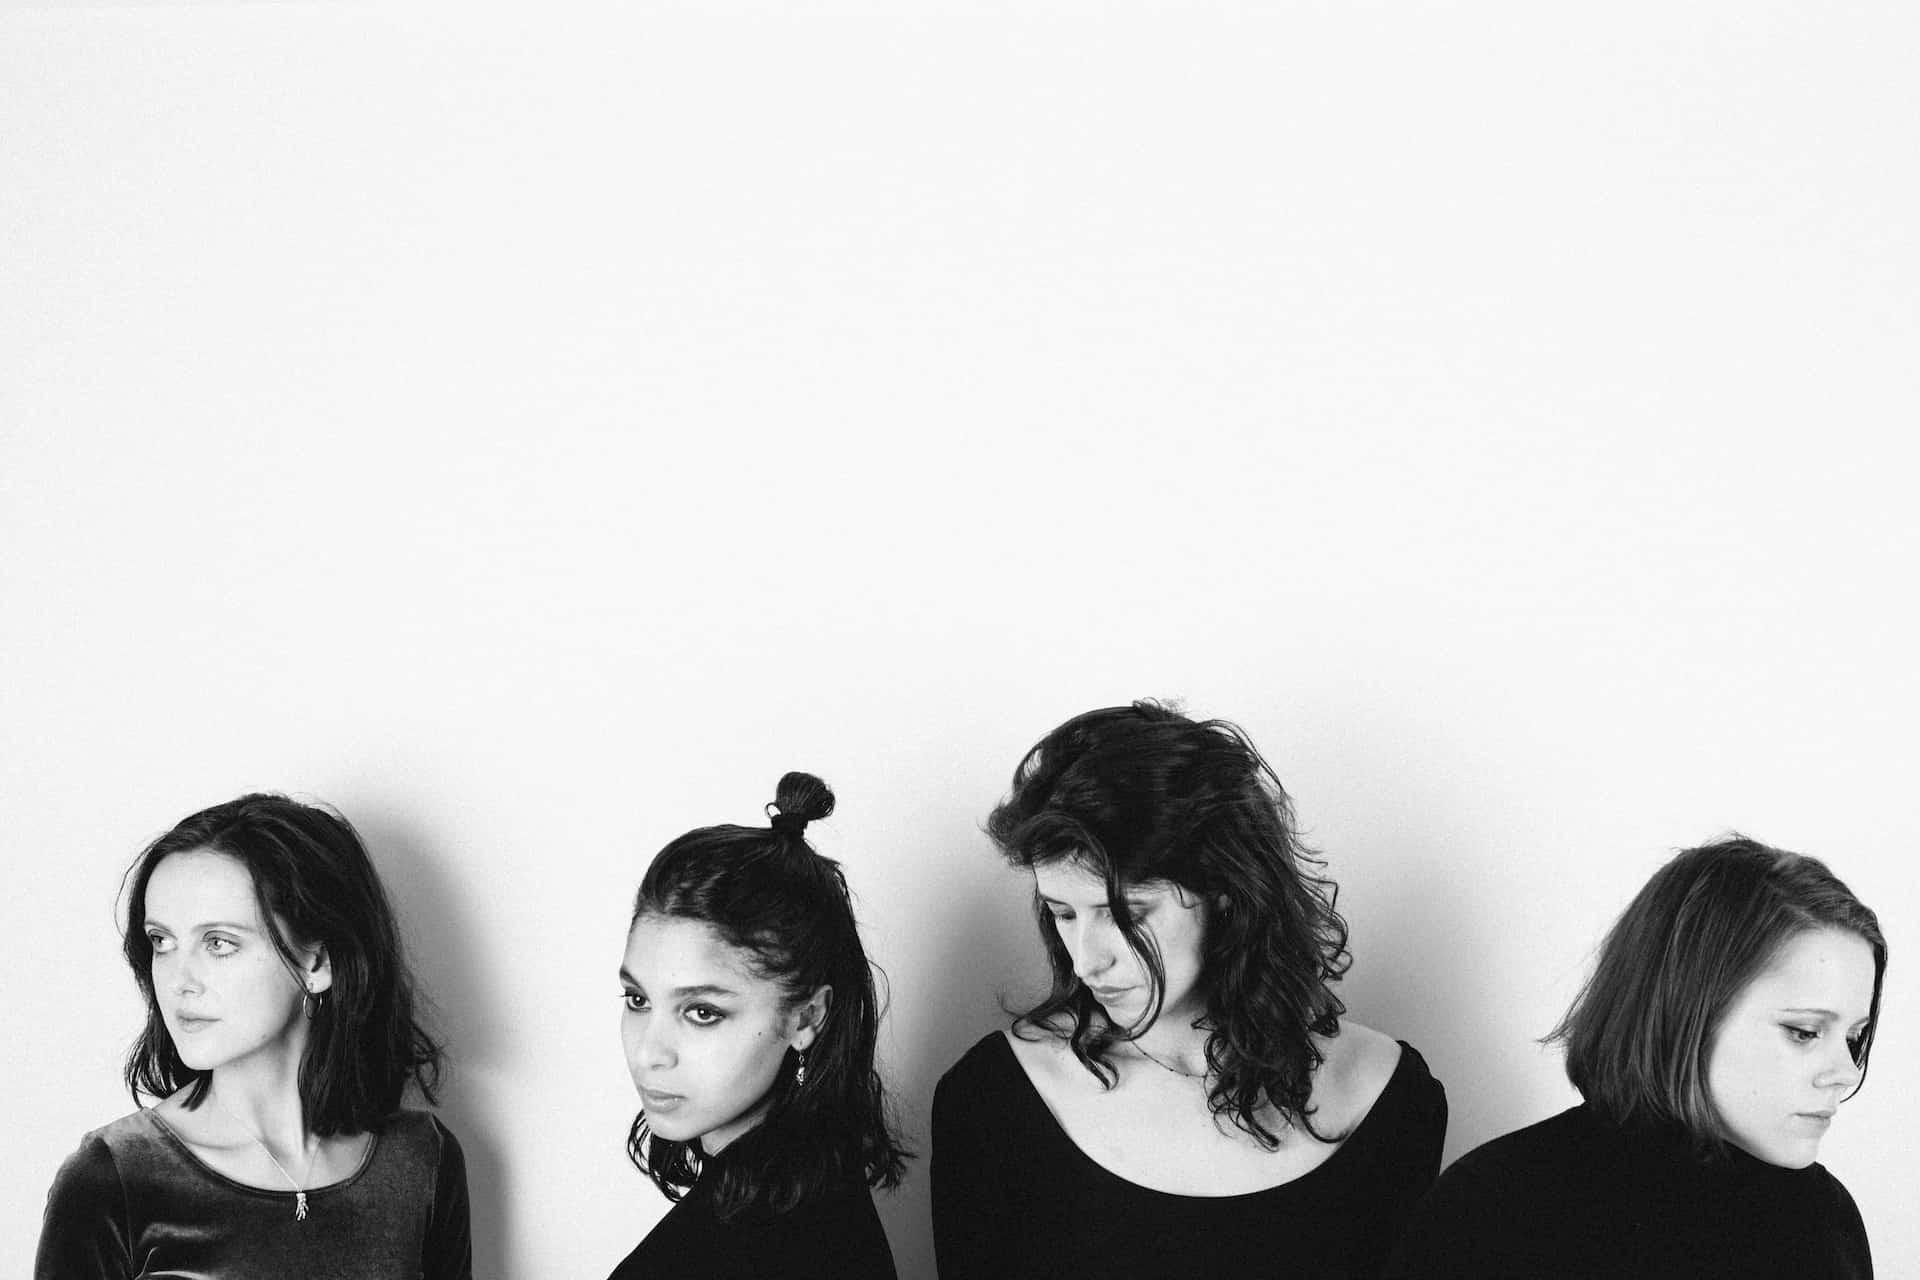 TRILLS: Women Make Music